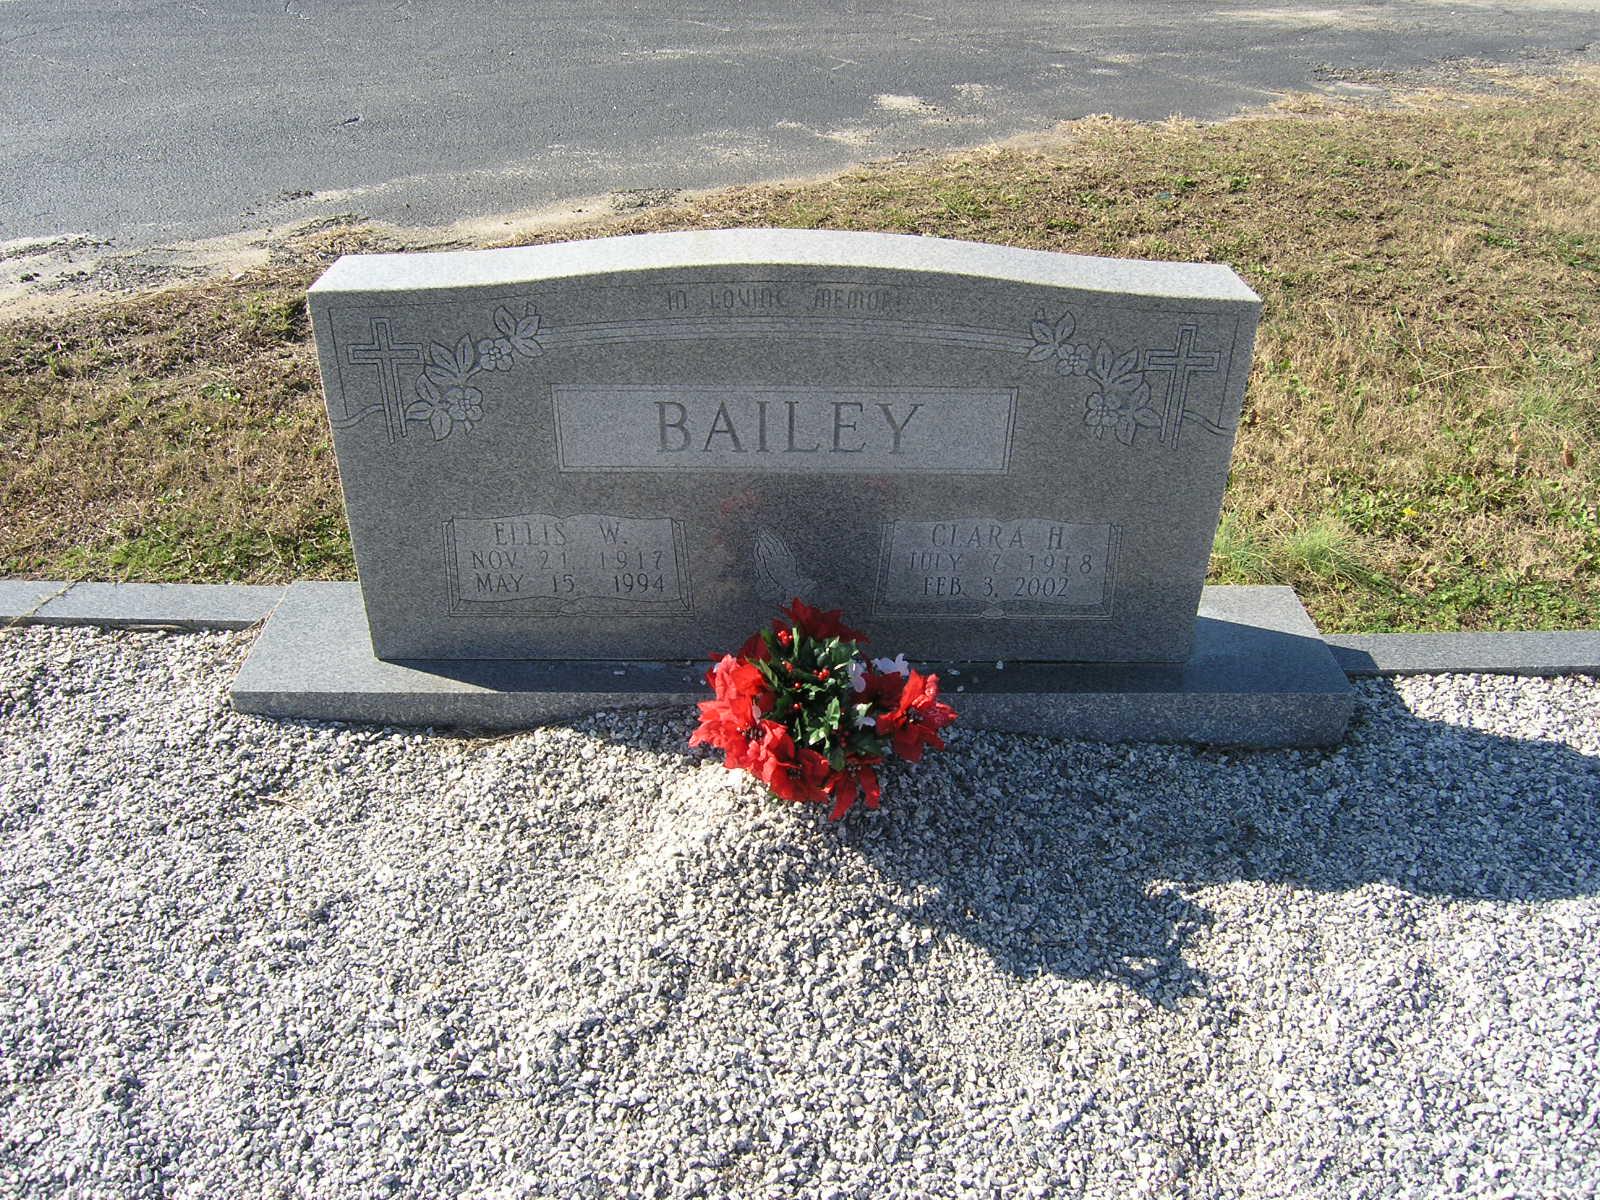 Ellis Workman Bailey